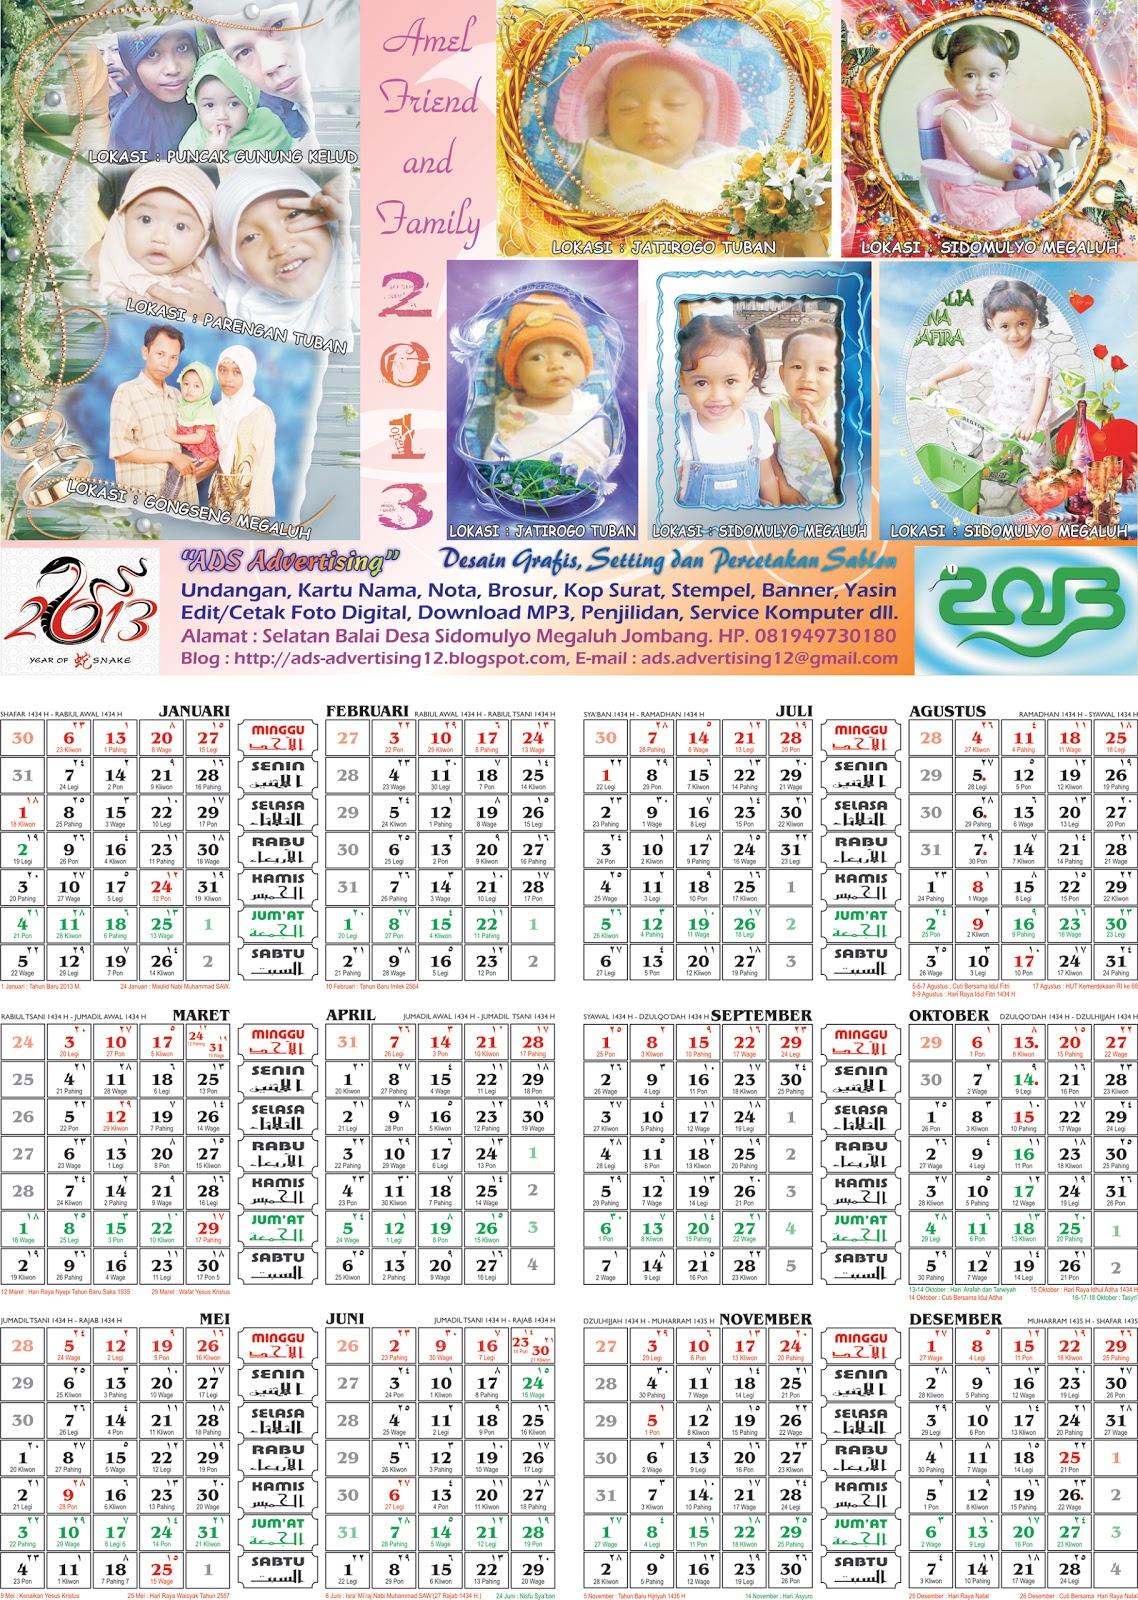 Download Kalender 2013 Gratis